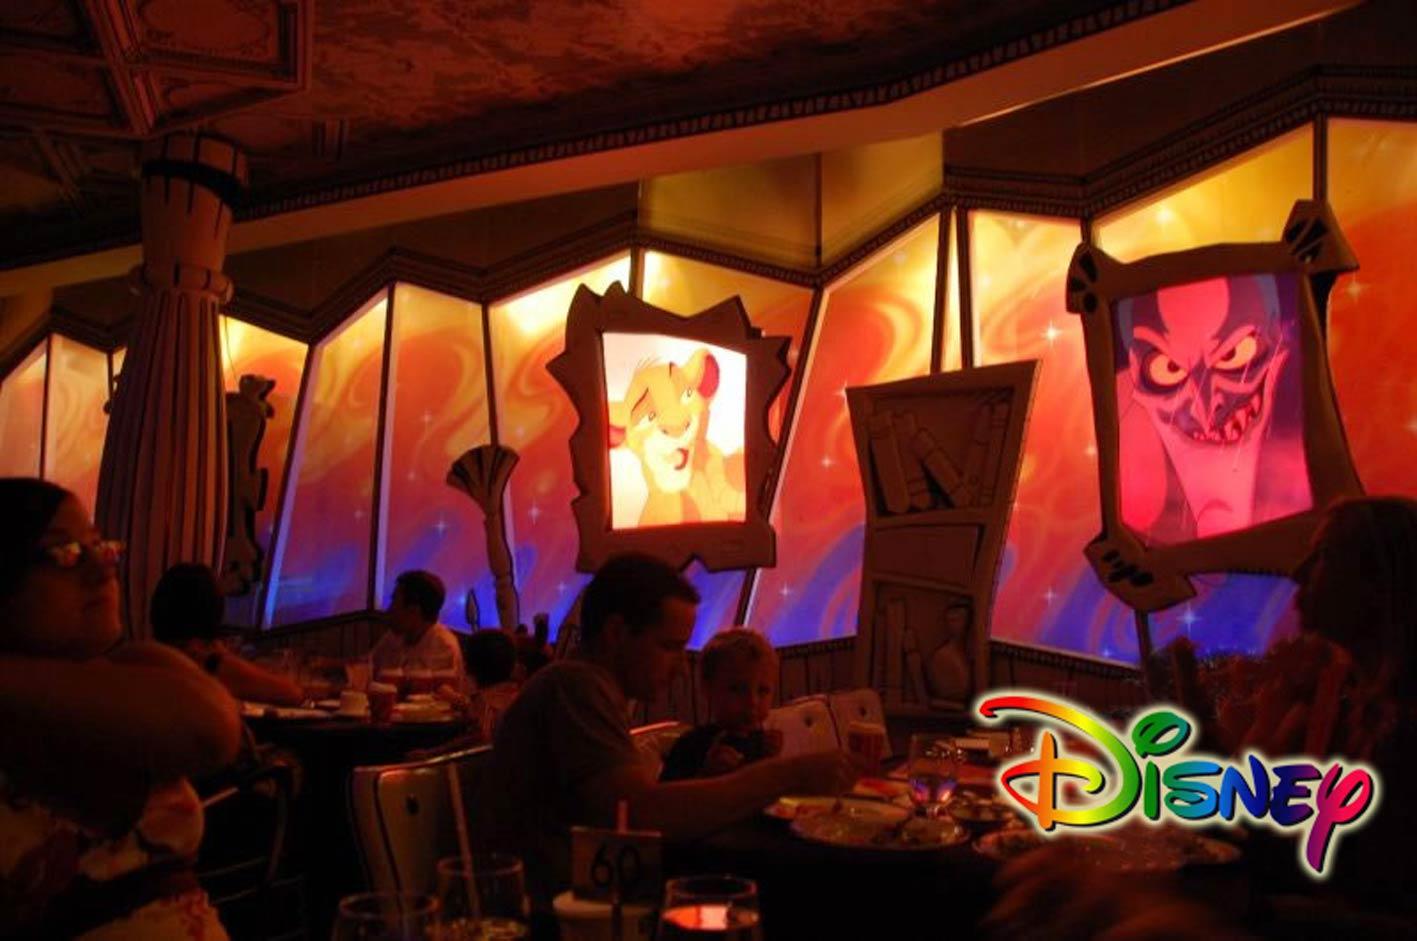 Restoration to the Disney restaurant onboard the Disney Wonder cruise ship.